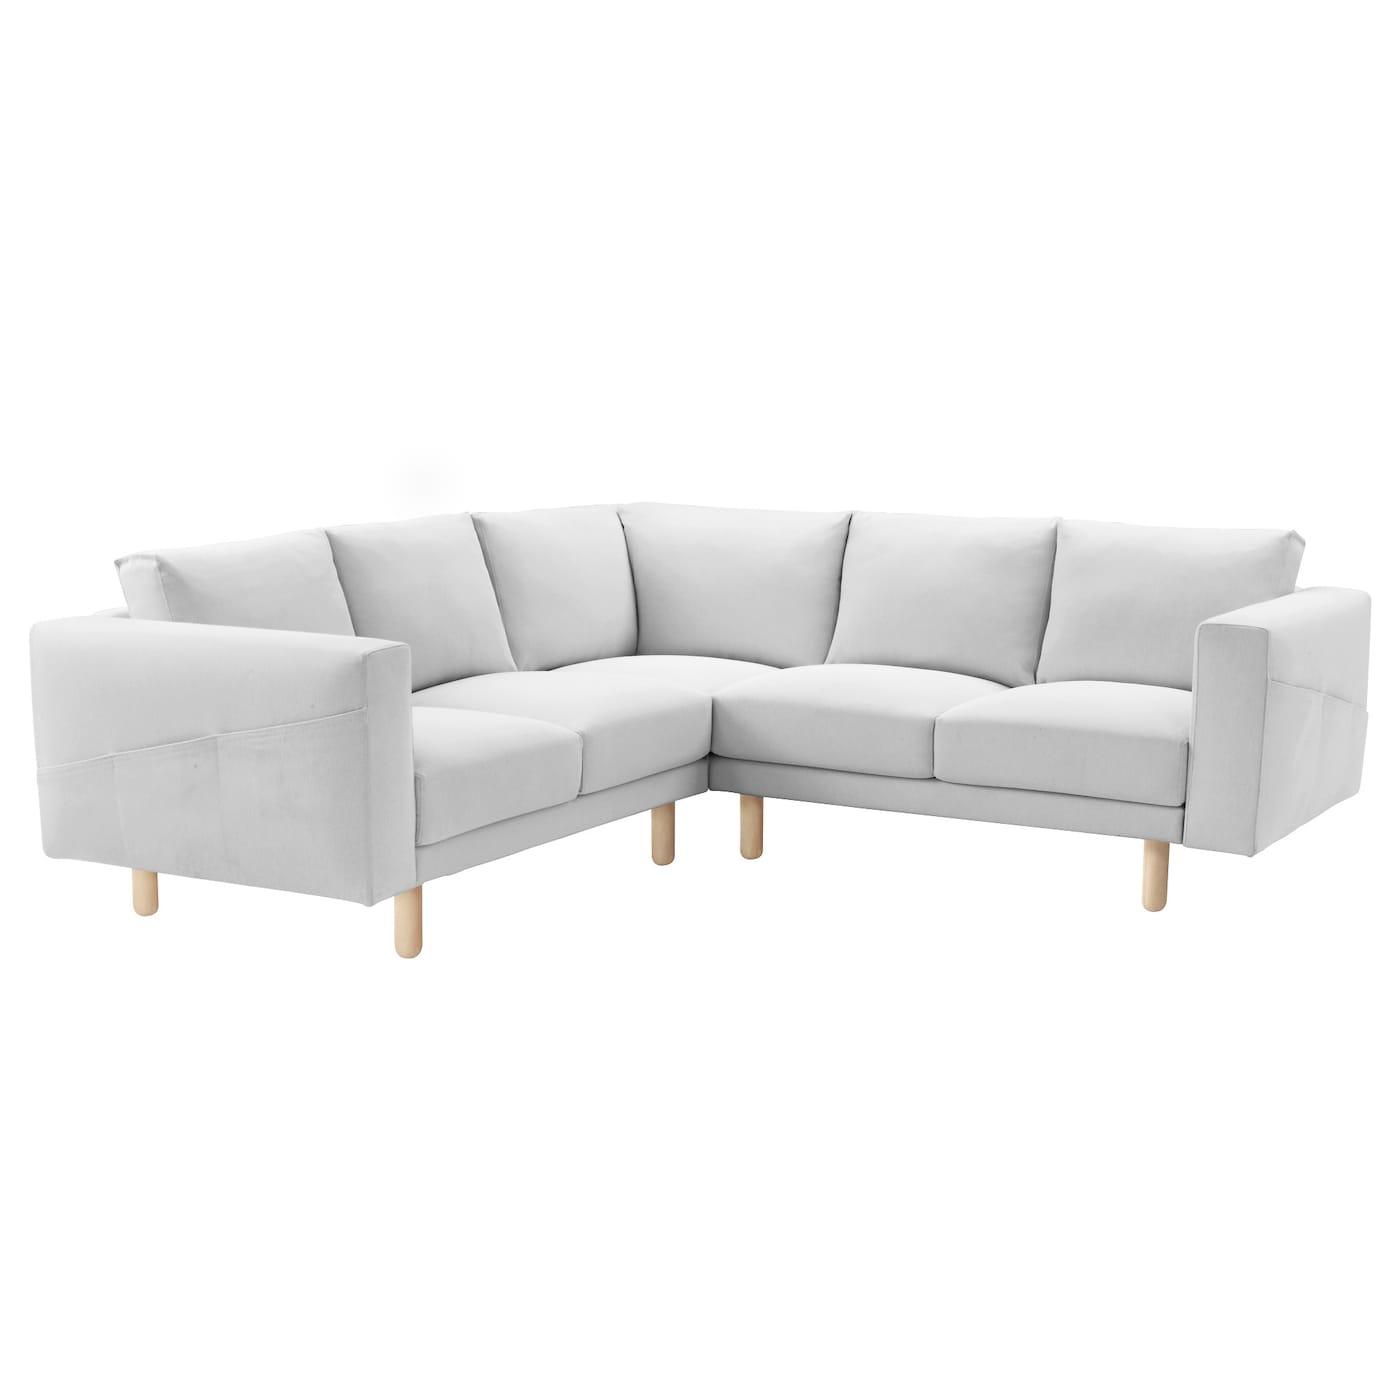 NORSBORG Corner sofa 4 seat Finnsta white birch IKEA